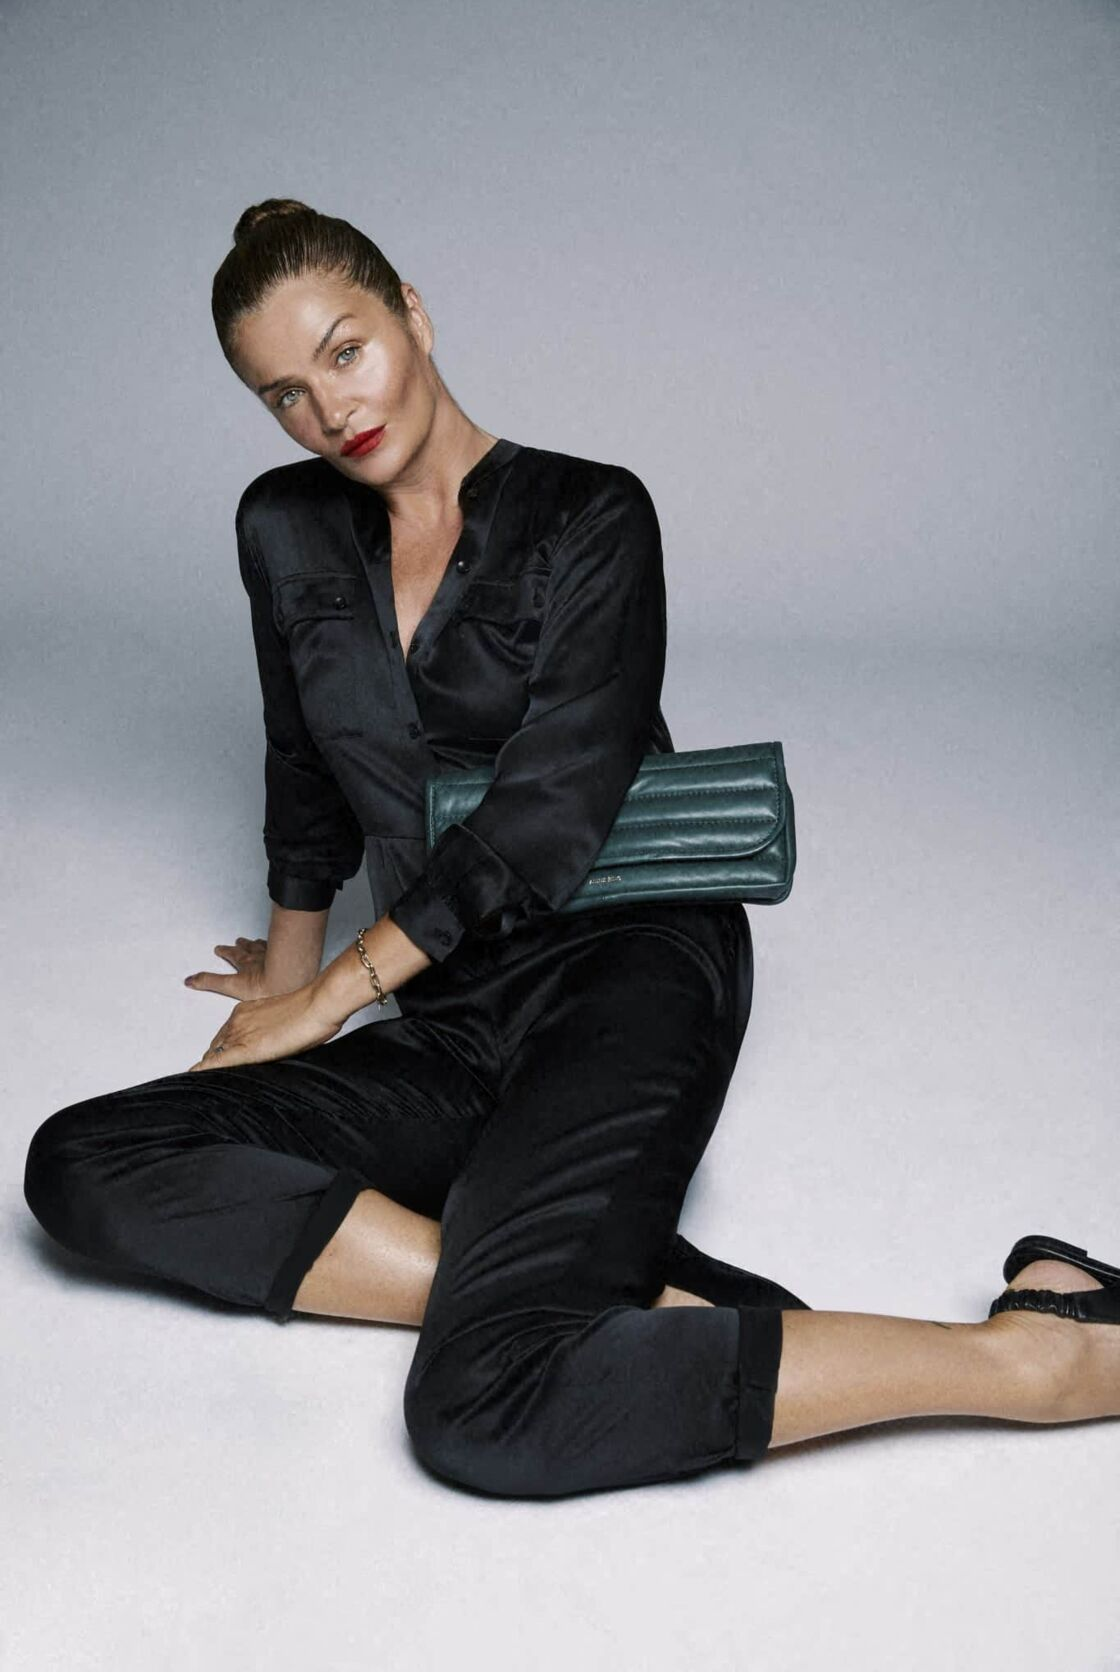 Helena Christensen porte la combinaison Rosalie, 100% soie de sa collab' avec Anine Bing (499 €, eu.aninebing.com).